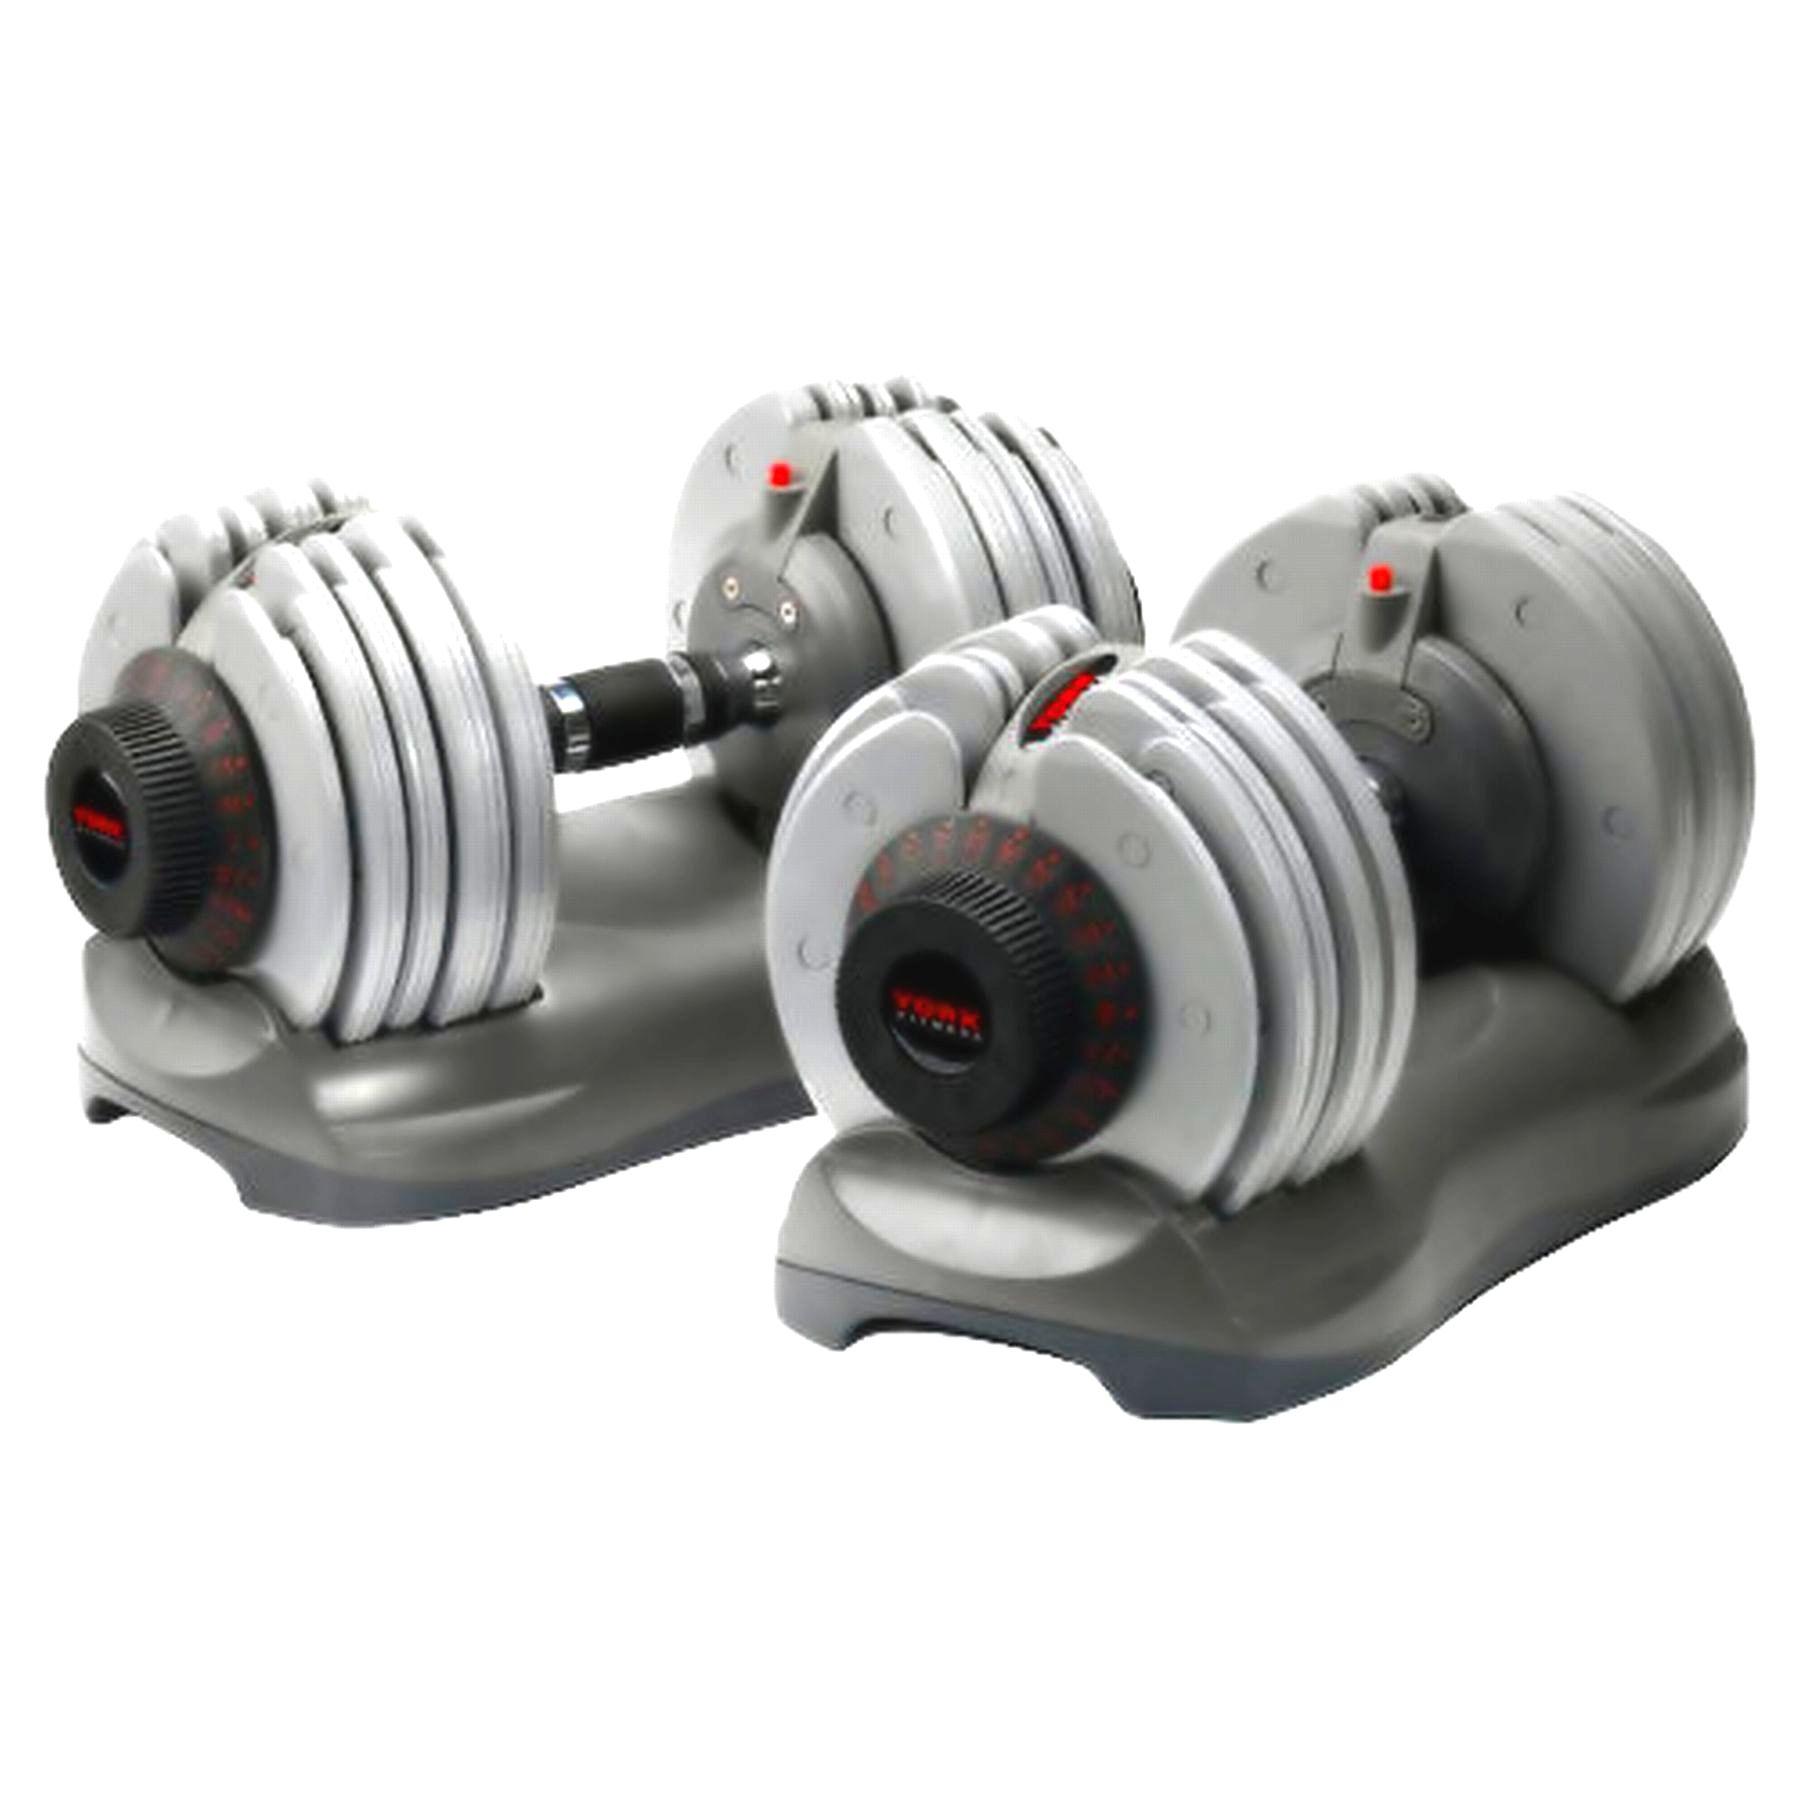 York Dial Tech 32 5kg Dumbbells Sweatband Com